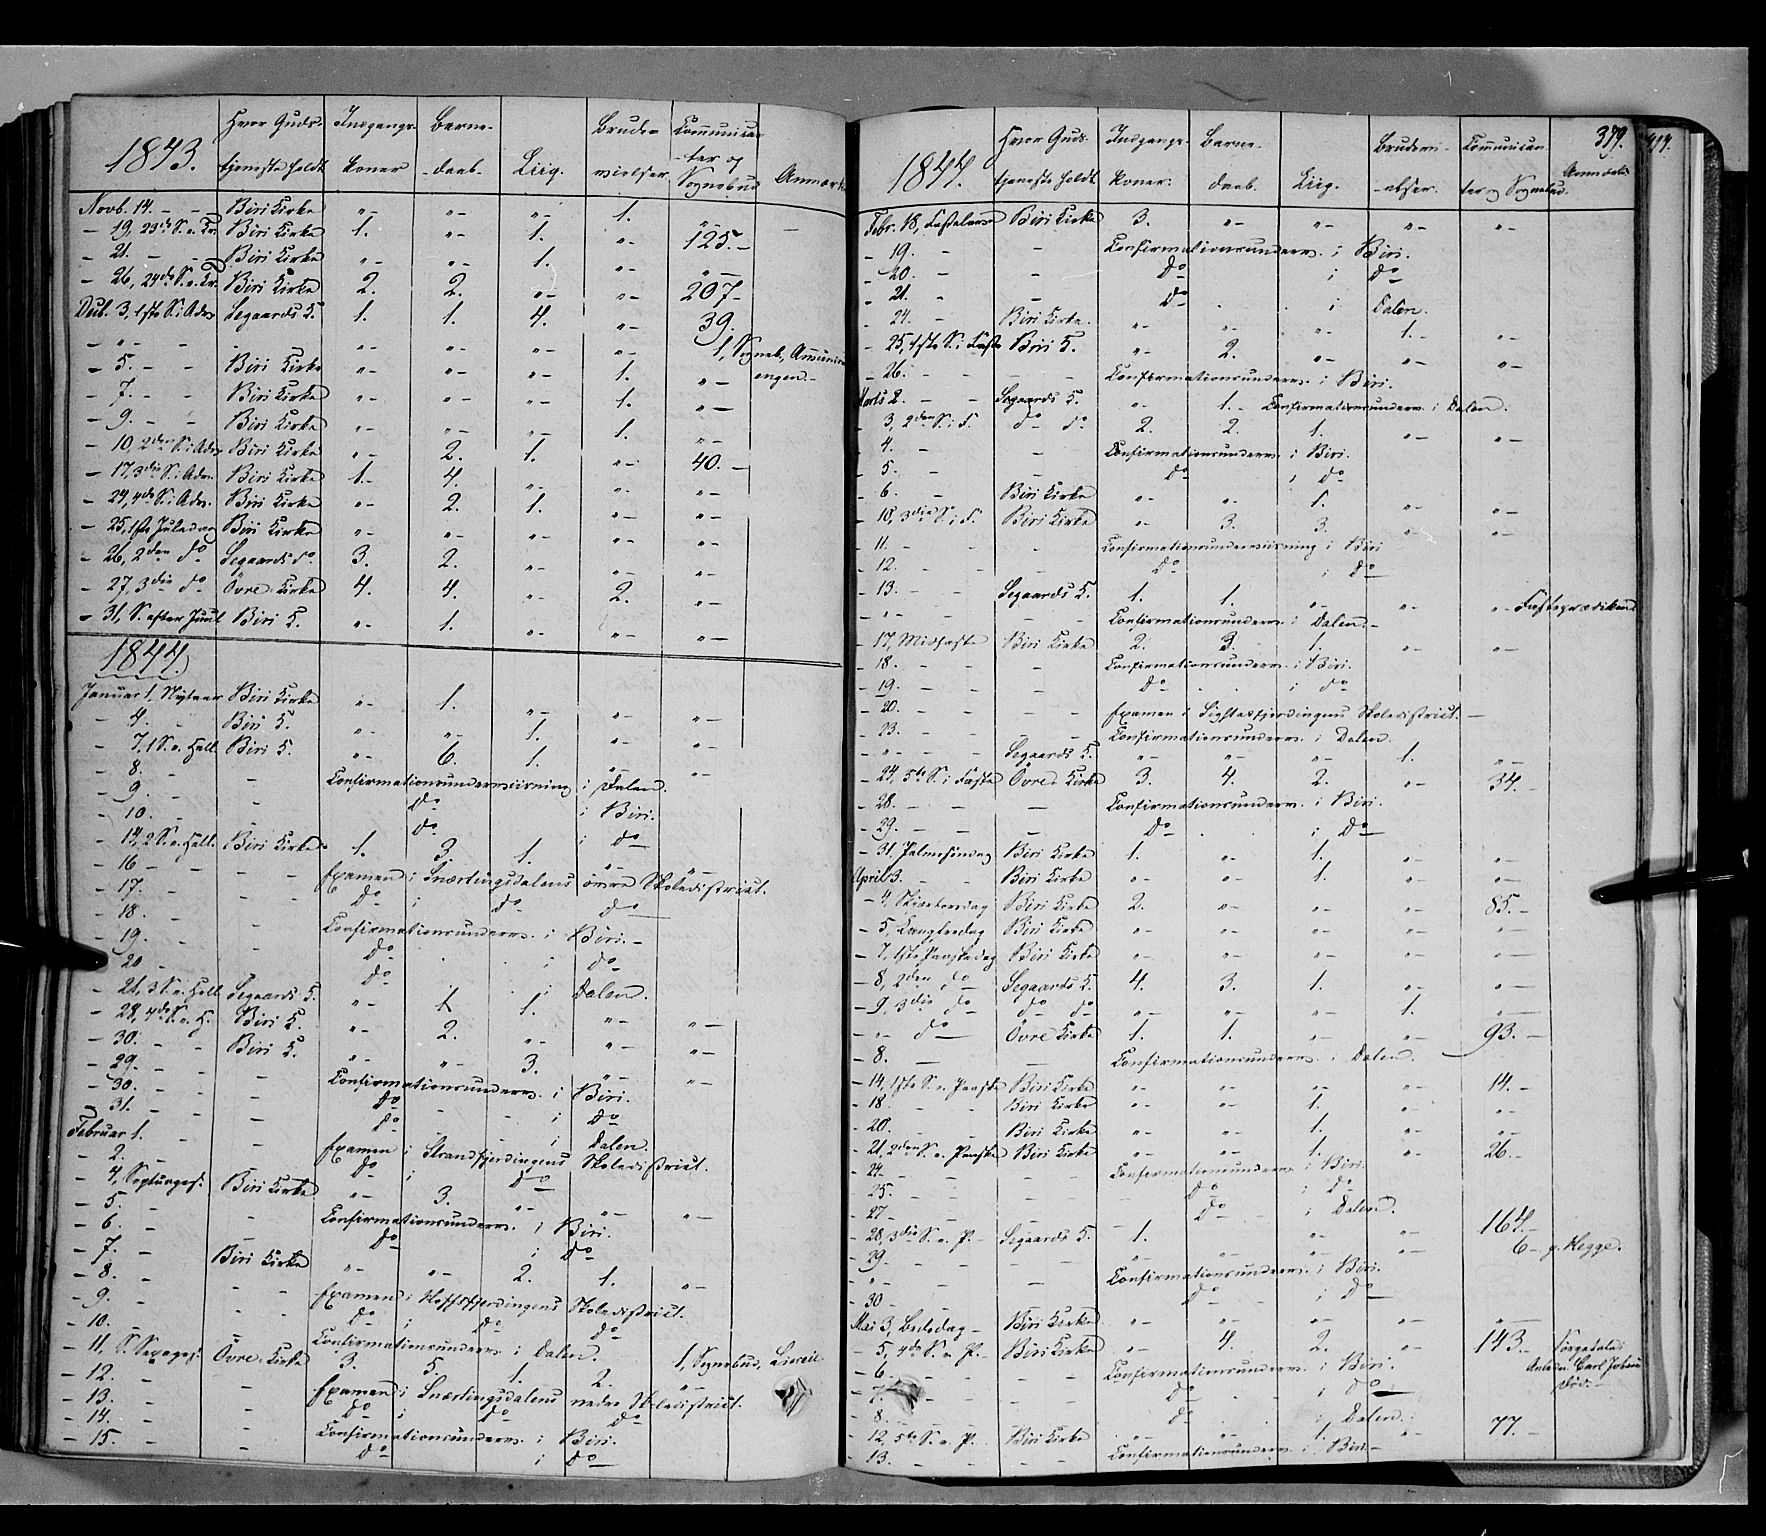 SAH, Biri prestekontor, Ministerialbok nr. 5, 1843-1854, s. 379